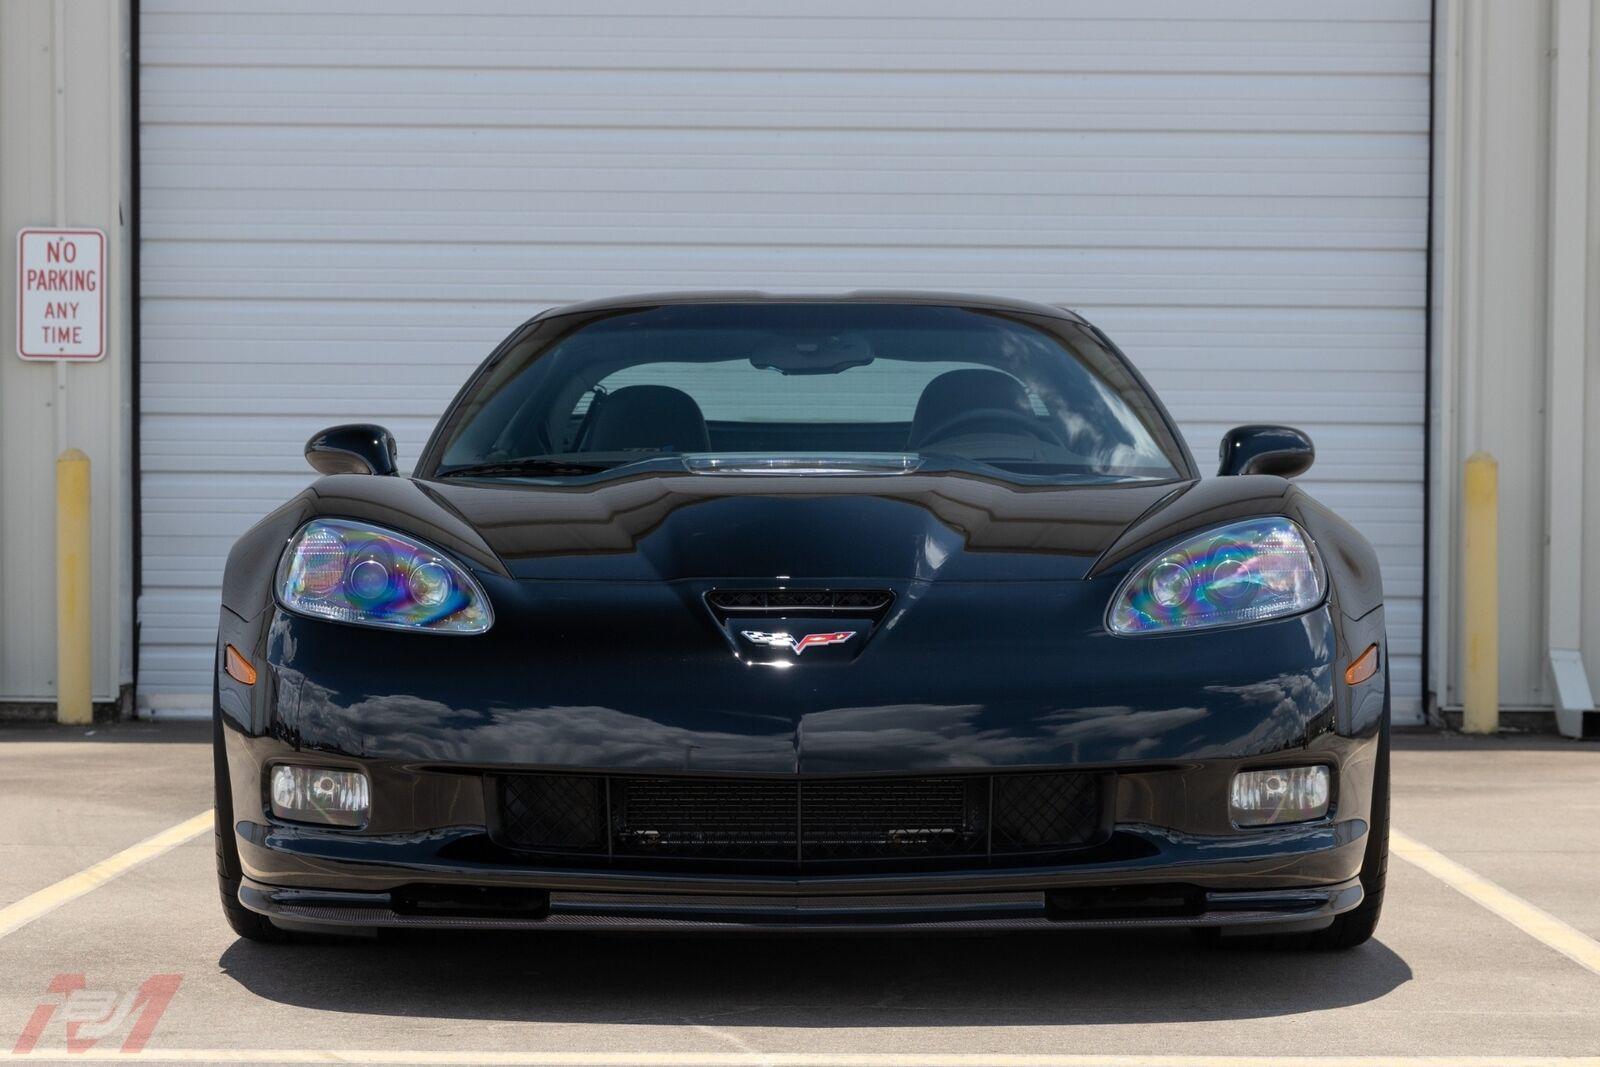 2009 Black Chevrolet Corvette ZR1    C6 Corvette Photo 6